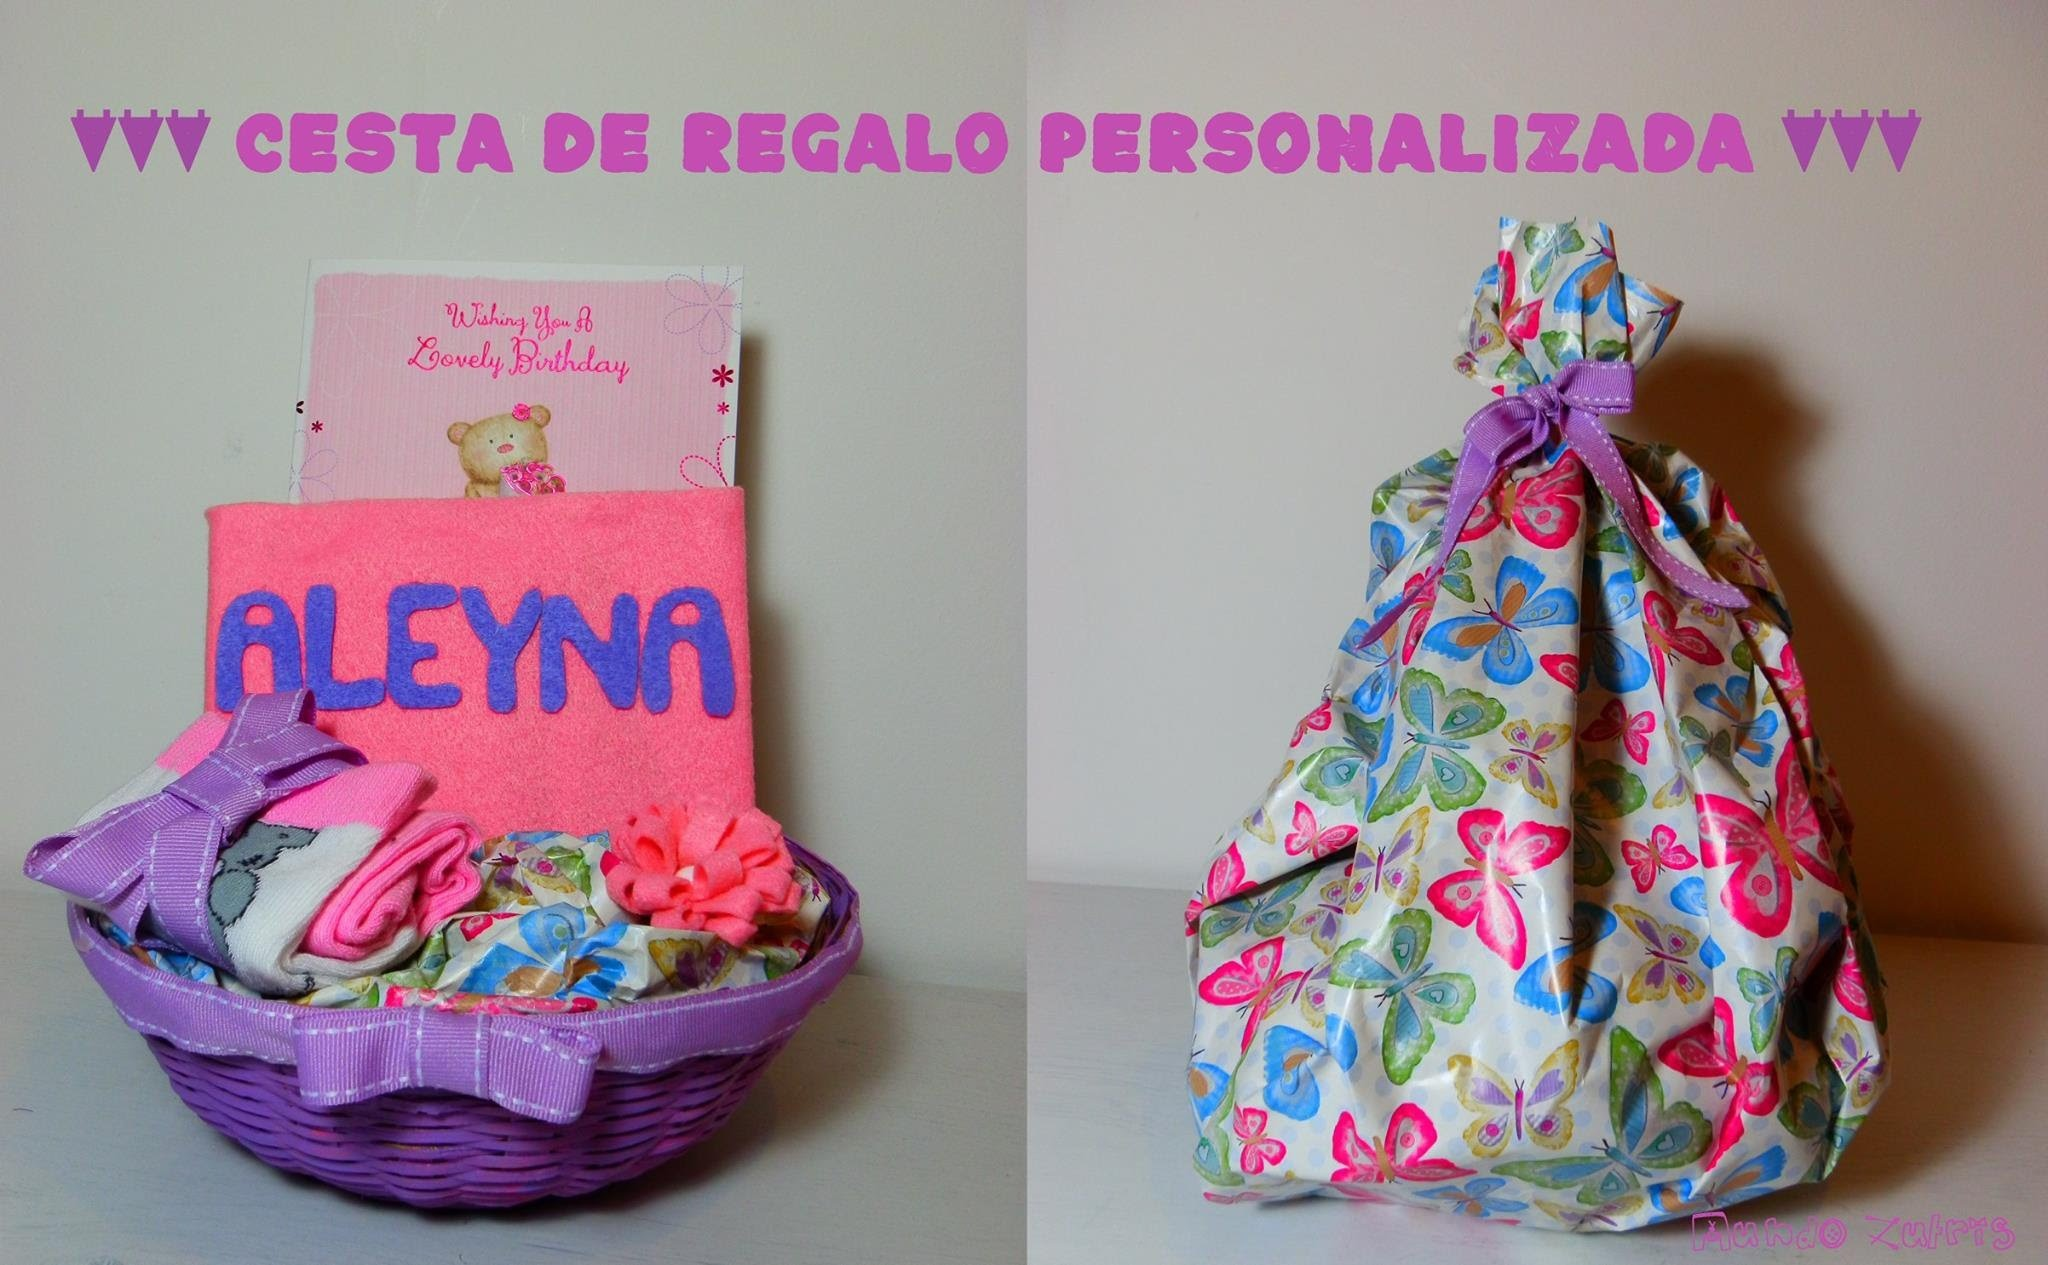 Cesta de regalo personalizada - personalized gift basket